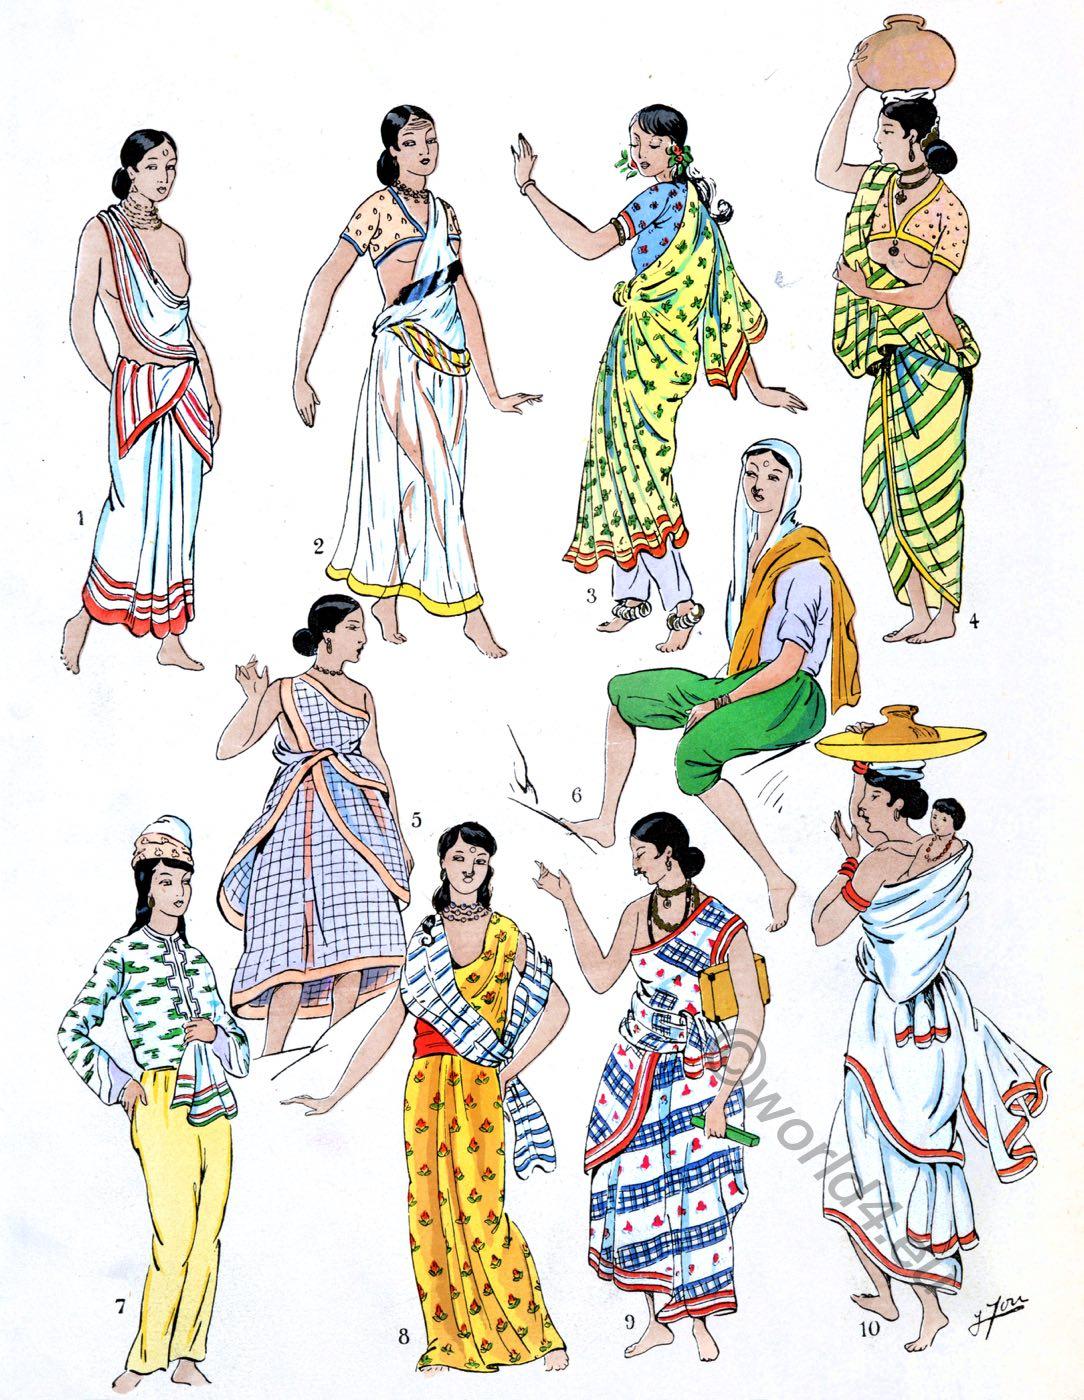 India dresses, garments, Fashion History, Costumes, Paul Louis de Giafferri